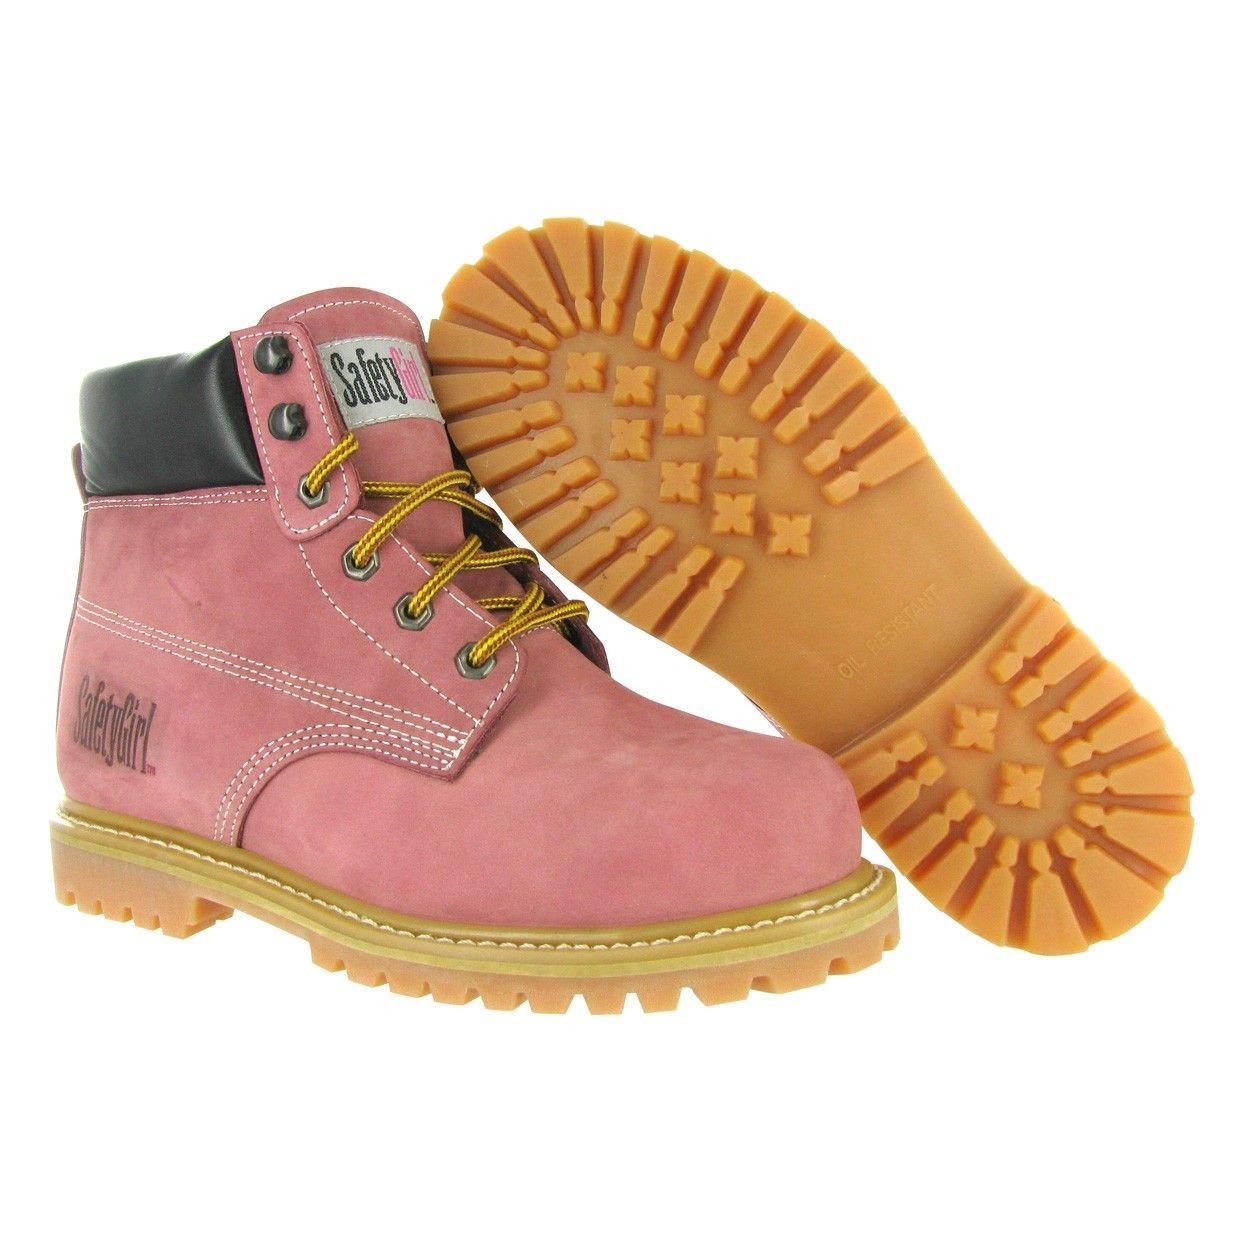 Girl Steel Toe Work Boots - Light Pink